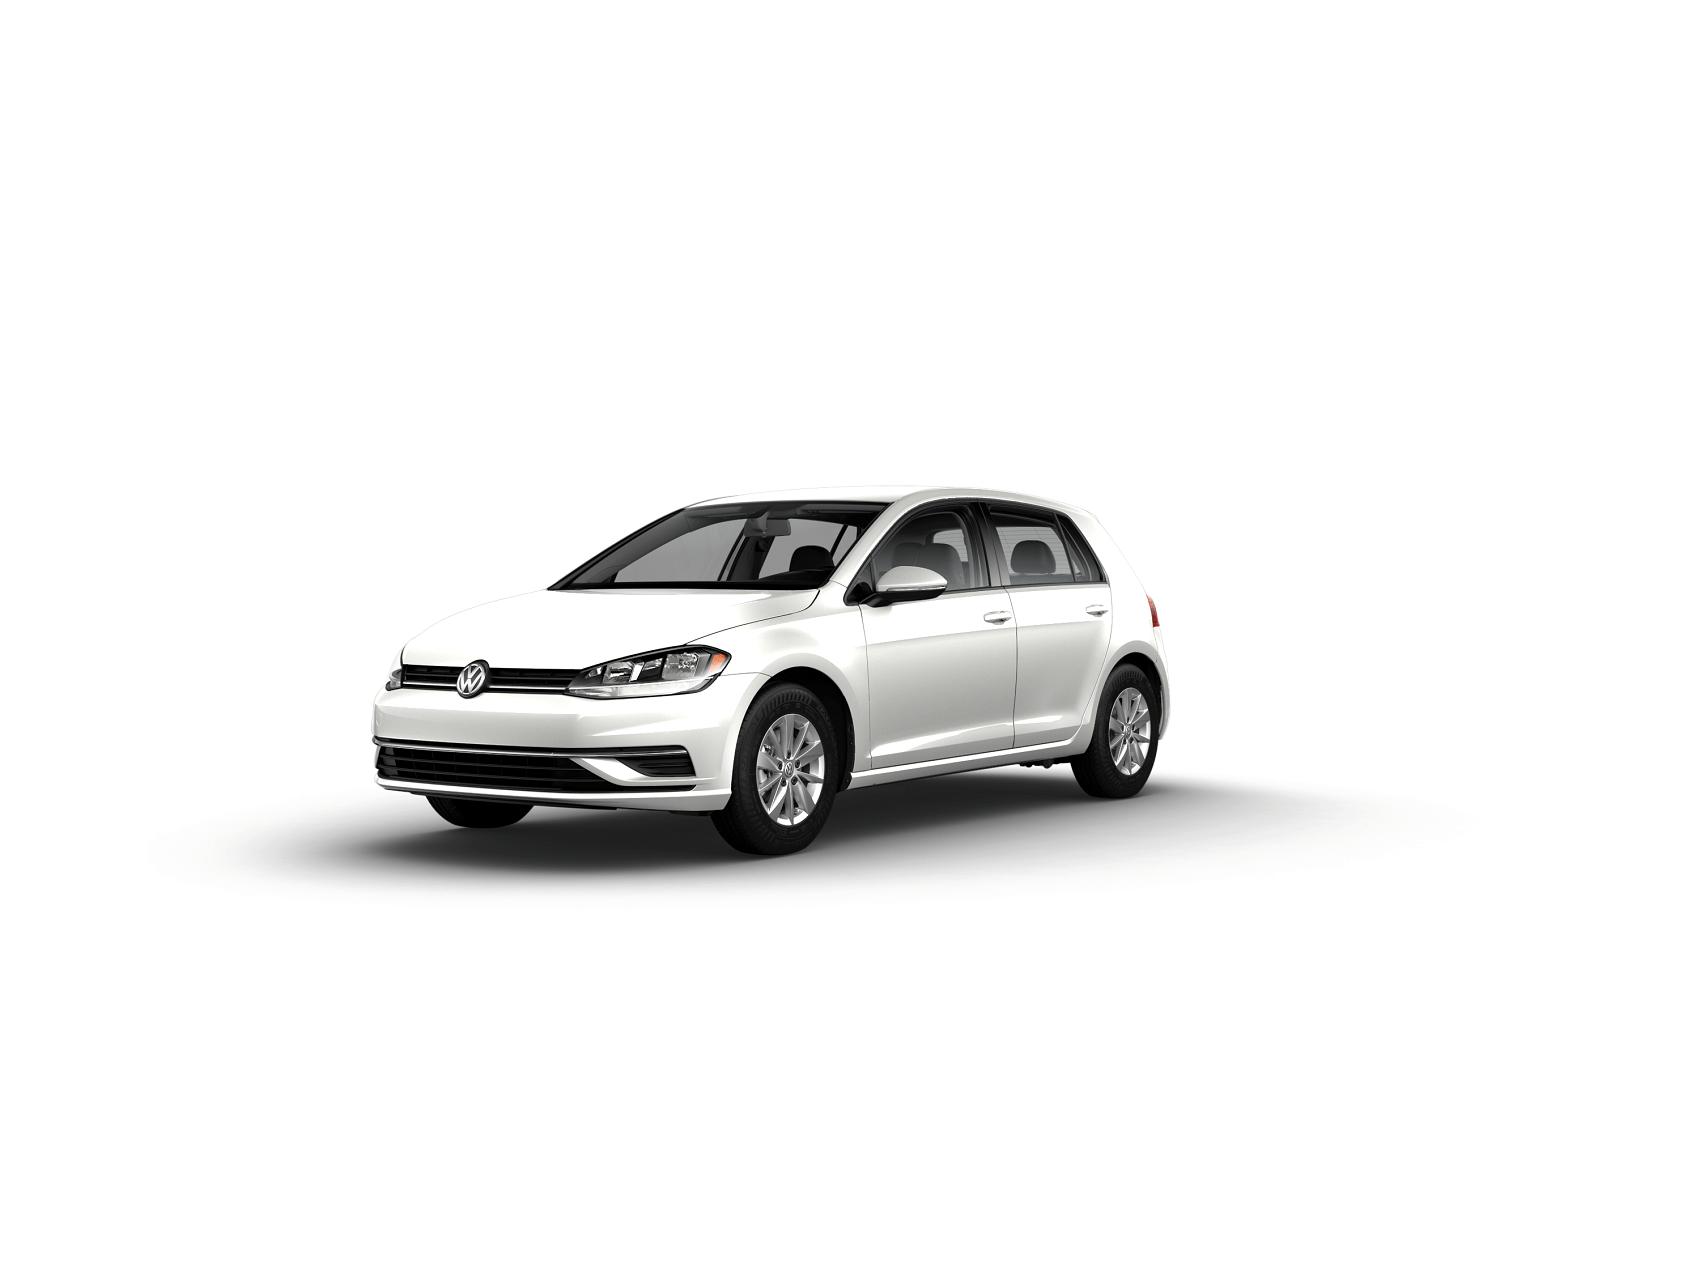 2019 VW Golf S Pure White